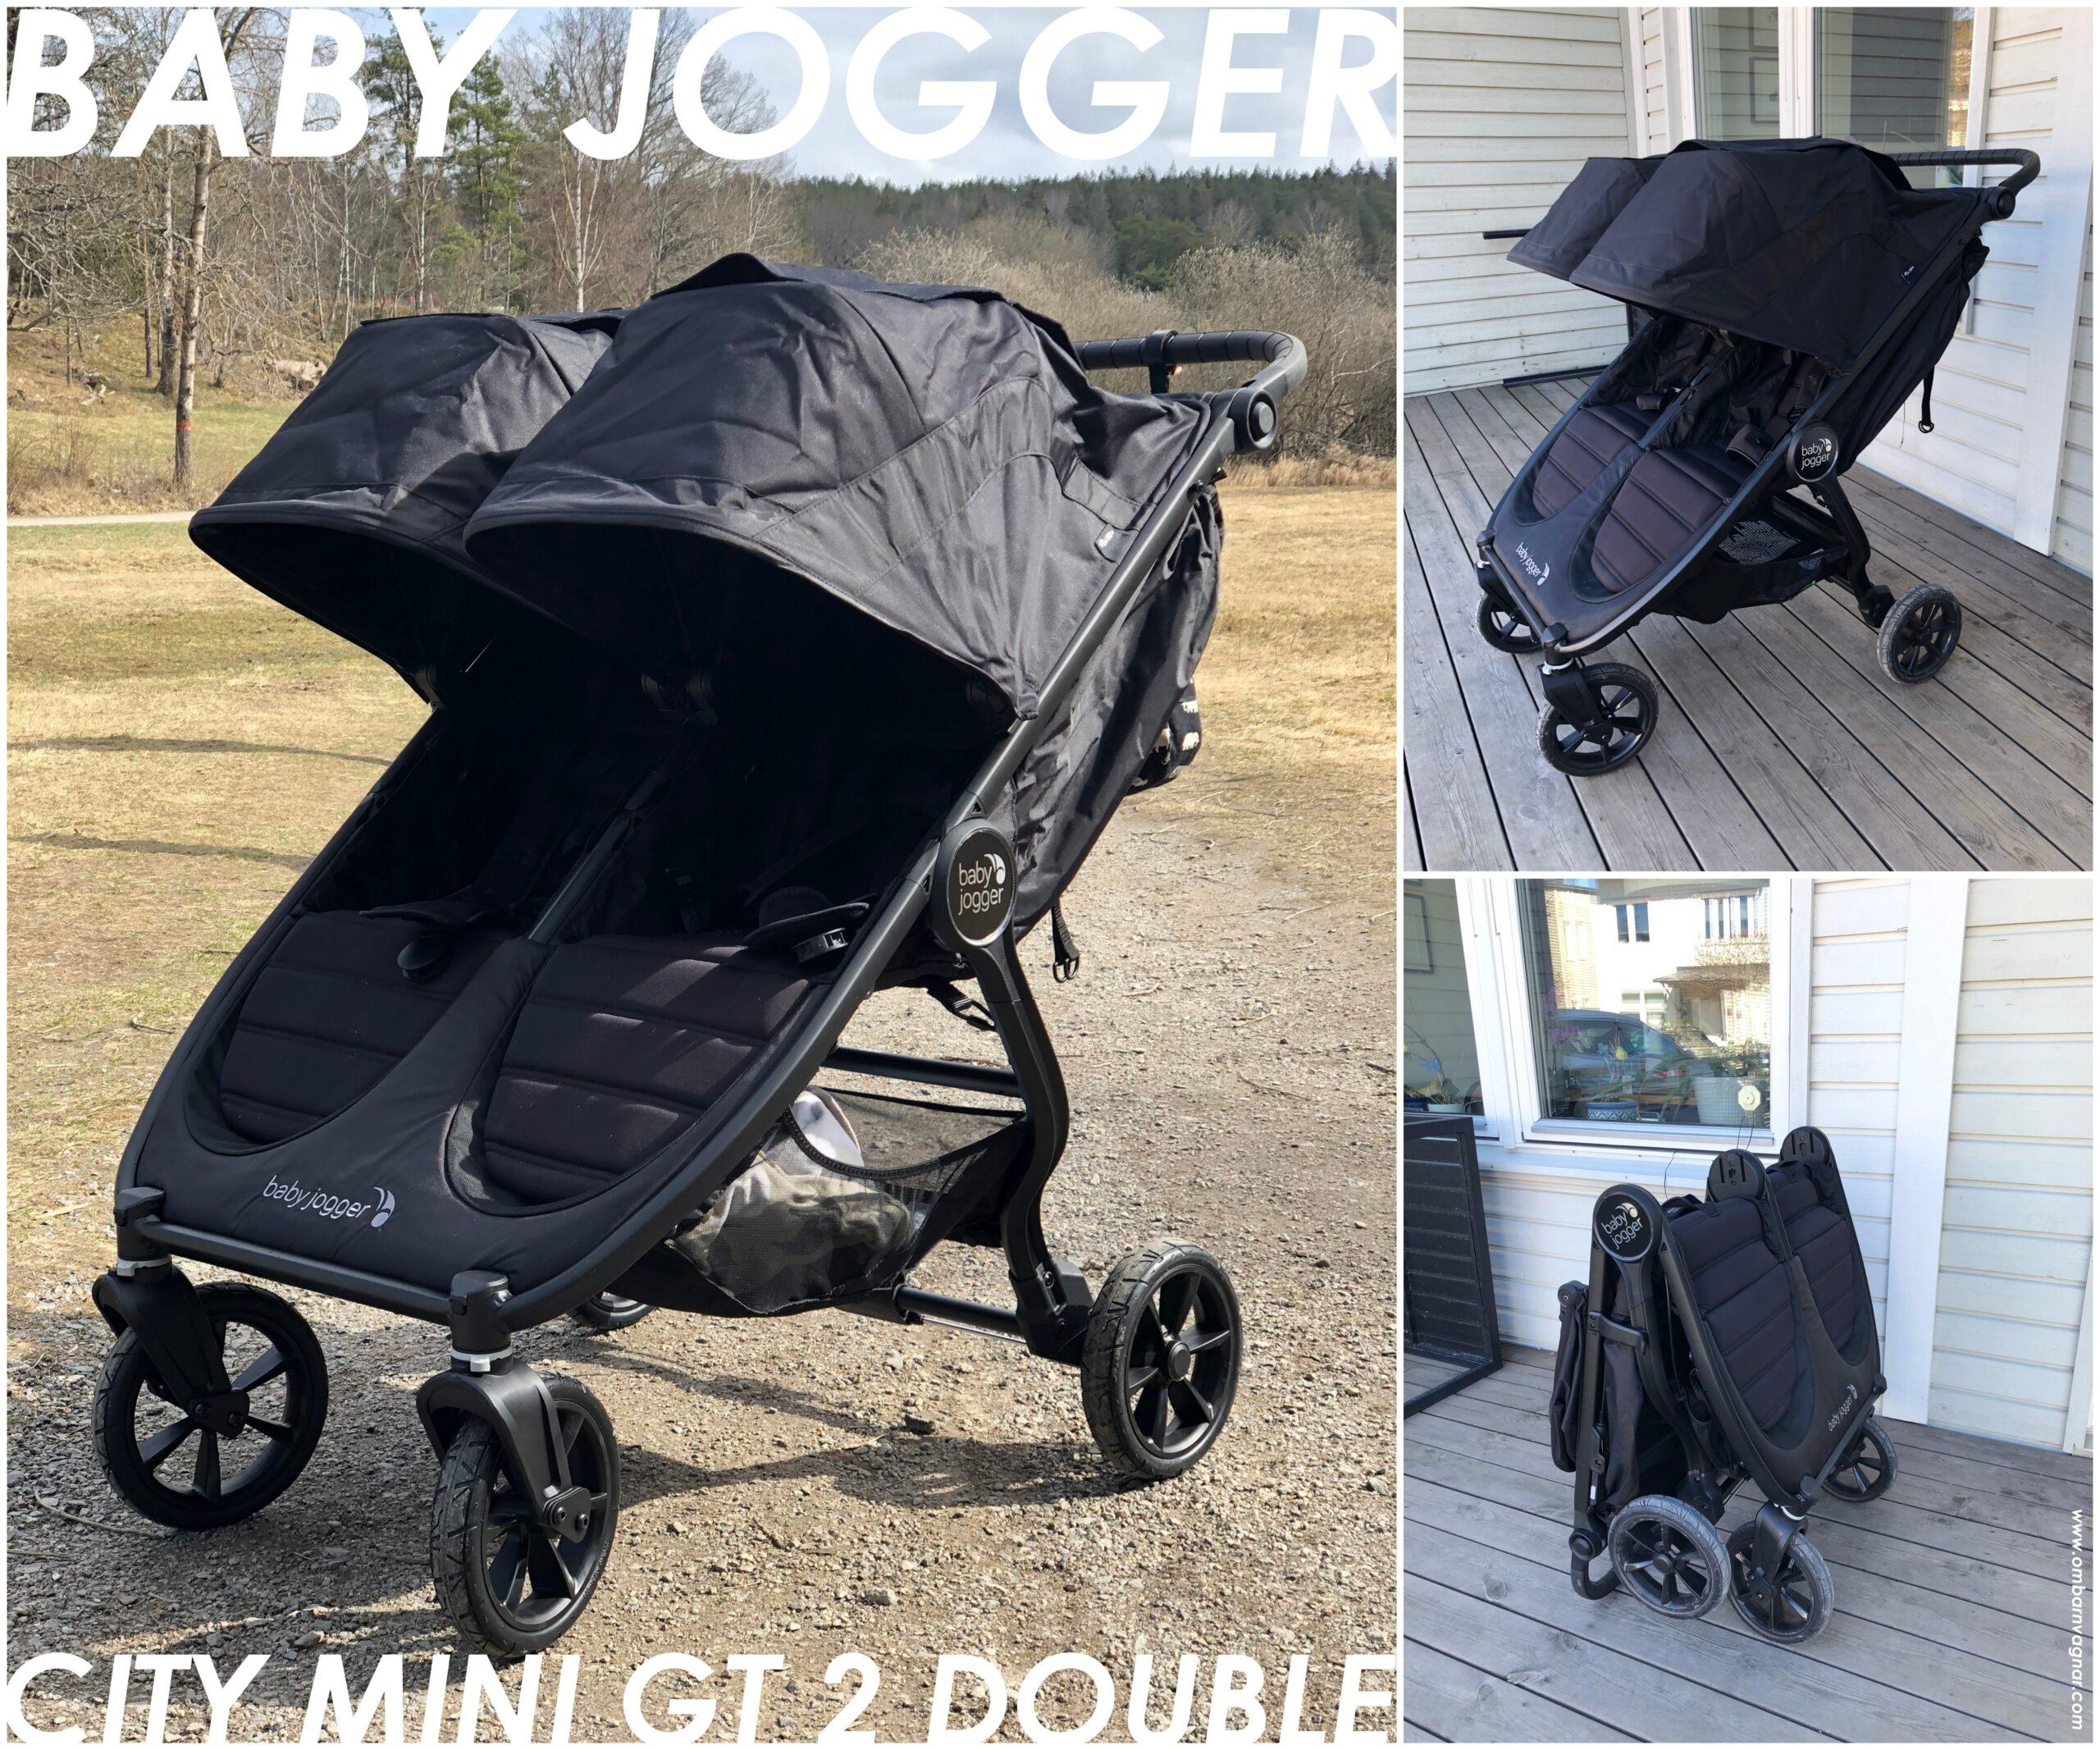 Recension av Baby Jogger City Mini GT 2 Double